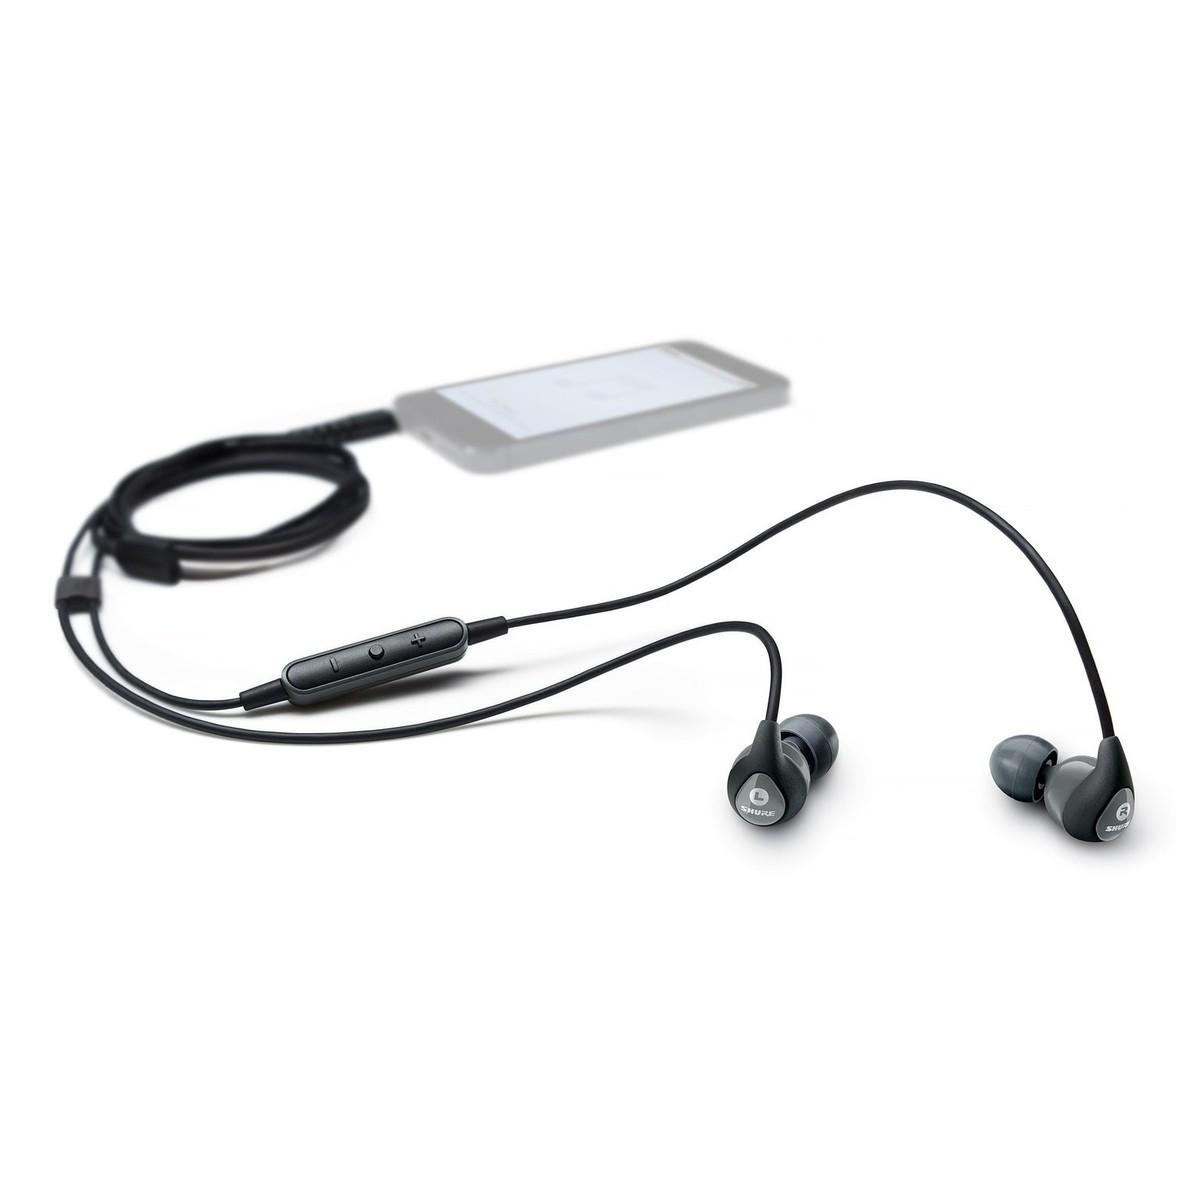 Wireless bluetooth headphones treblab - Shure SE112m+ - earphones with mic Overview